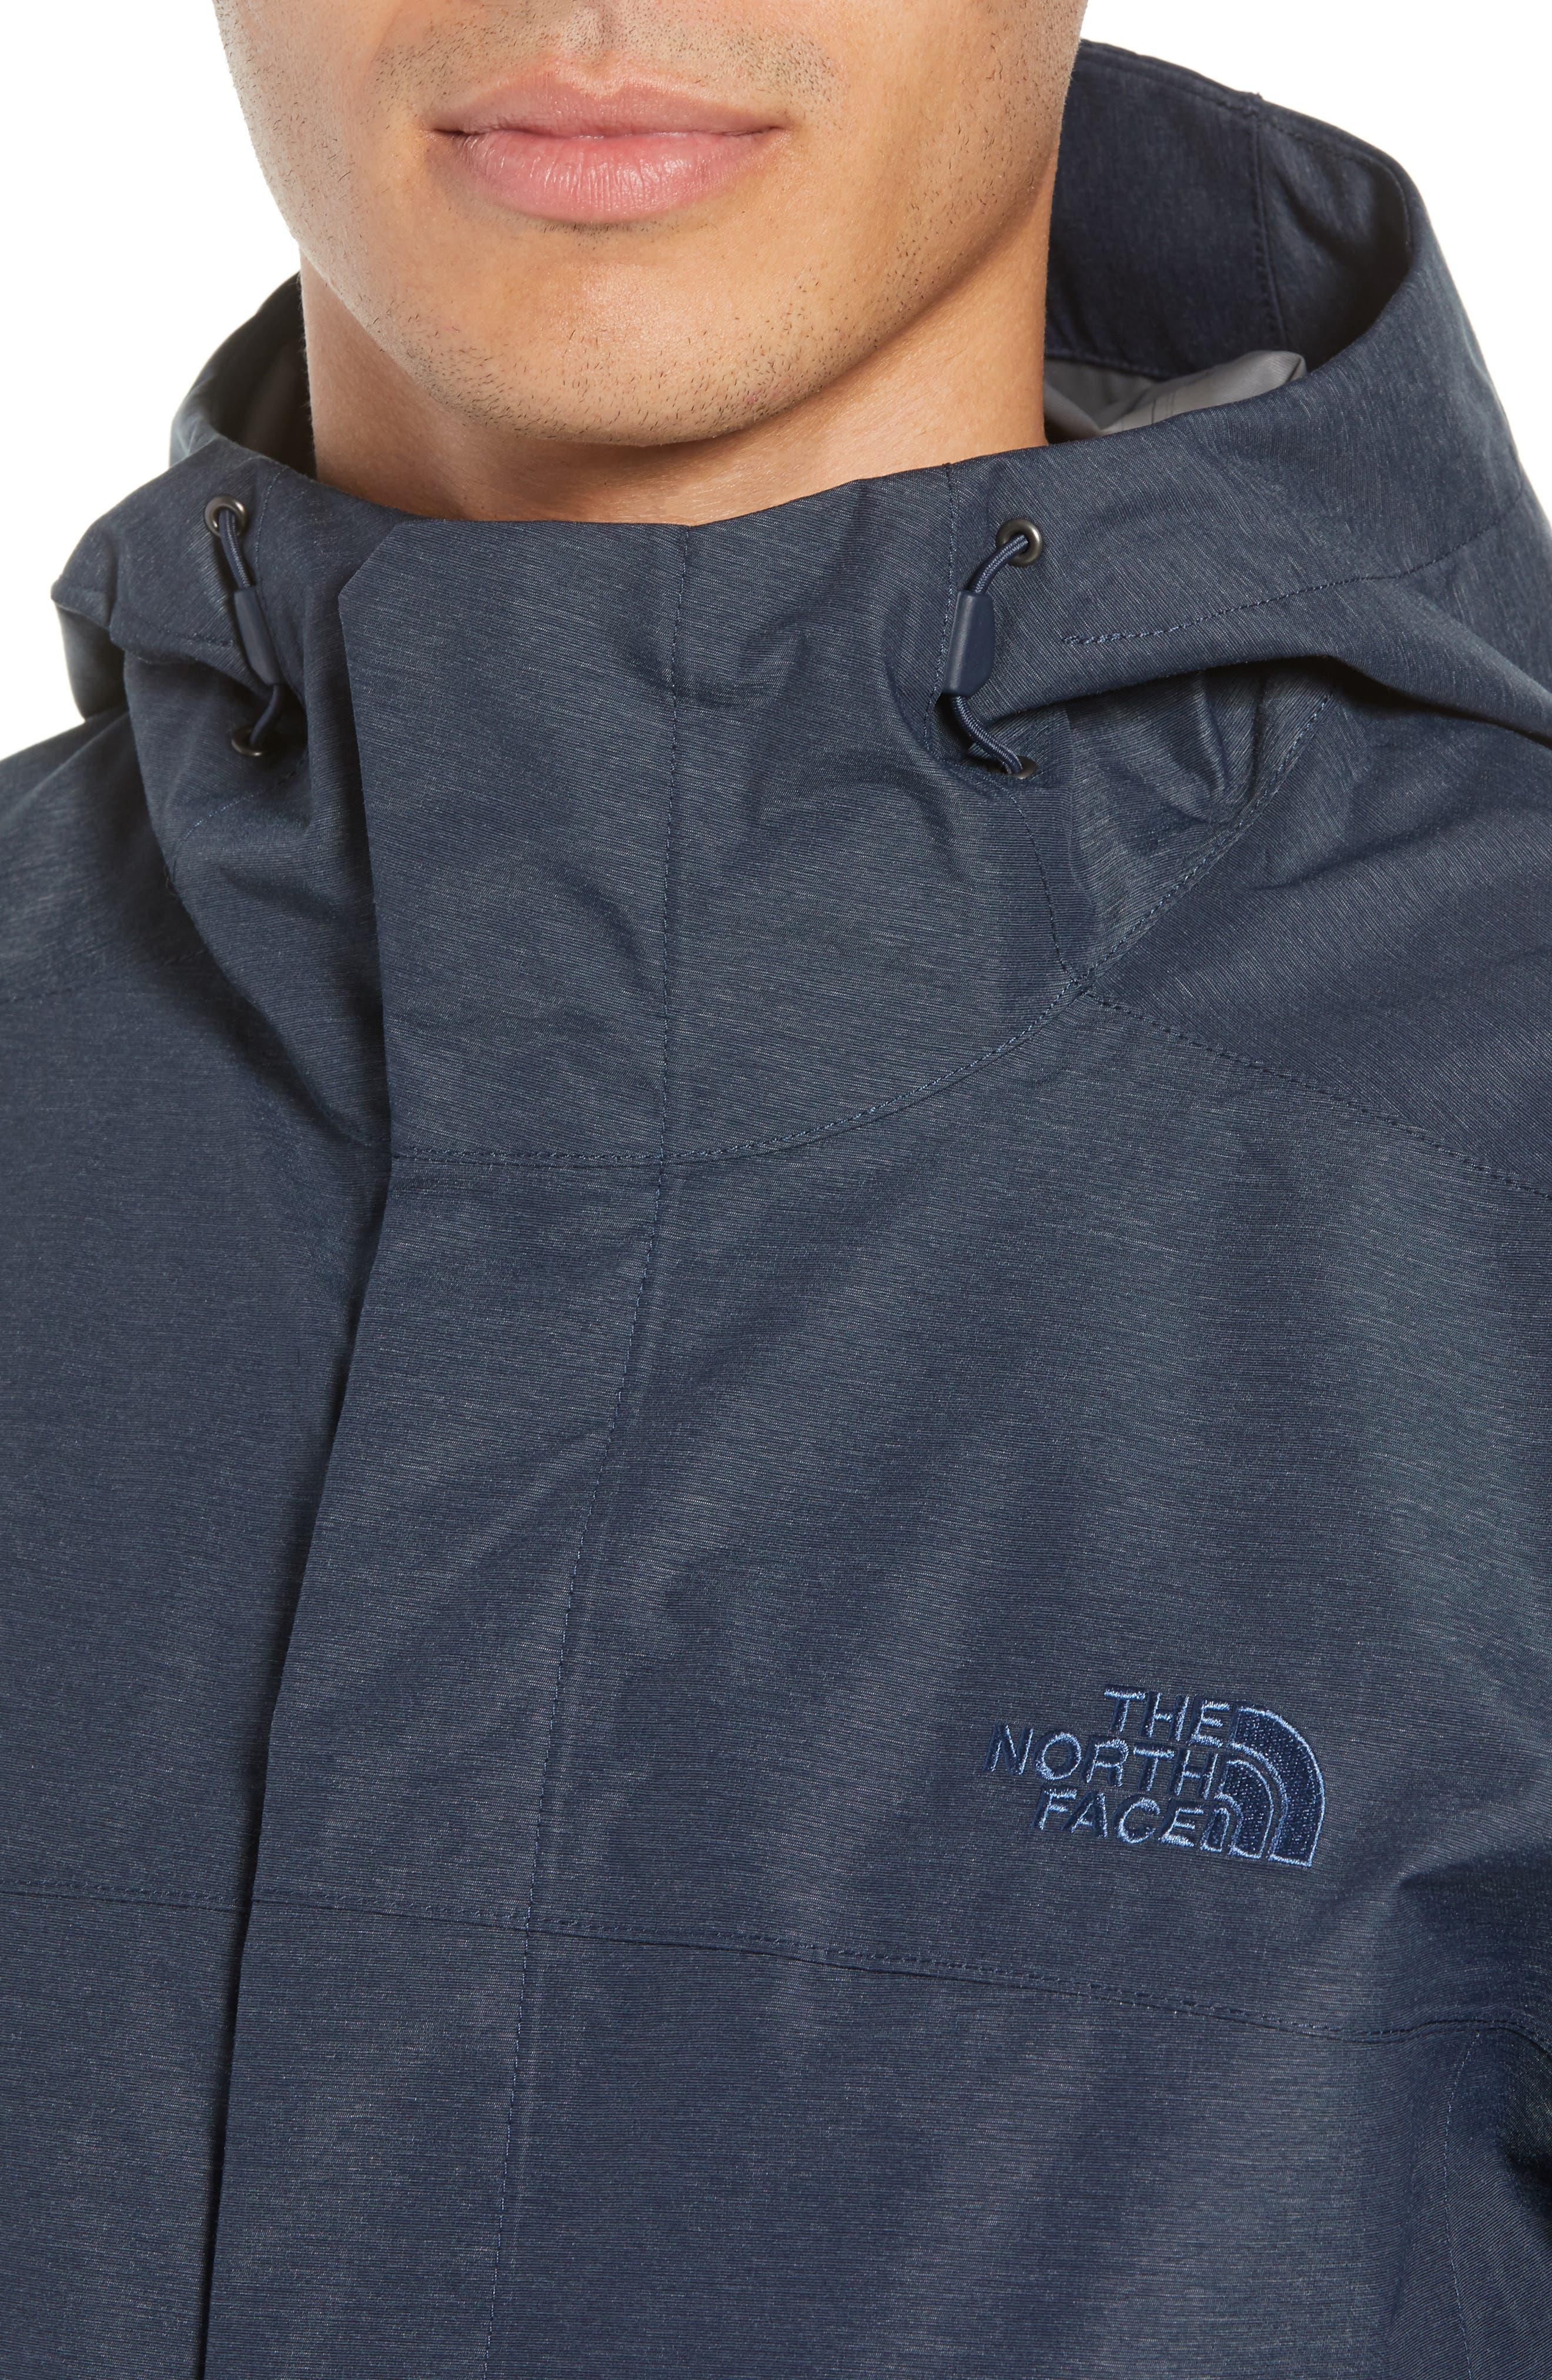 Venture 2 Waterproof Jacket,                             Alternate thumbnail 4, color,                             URBAN NAVY HEATHER